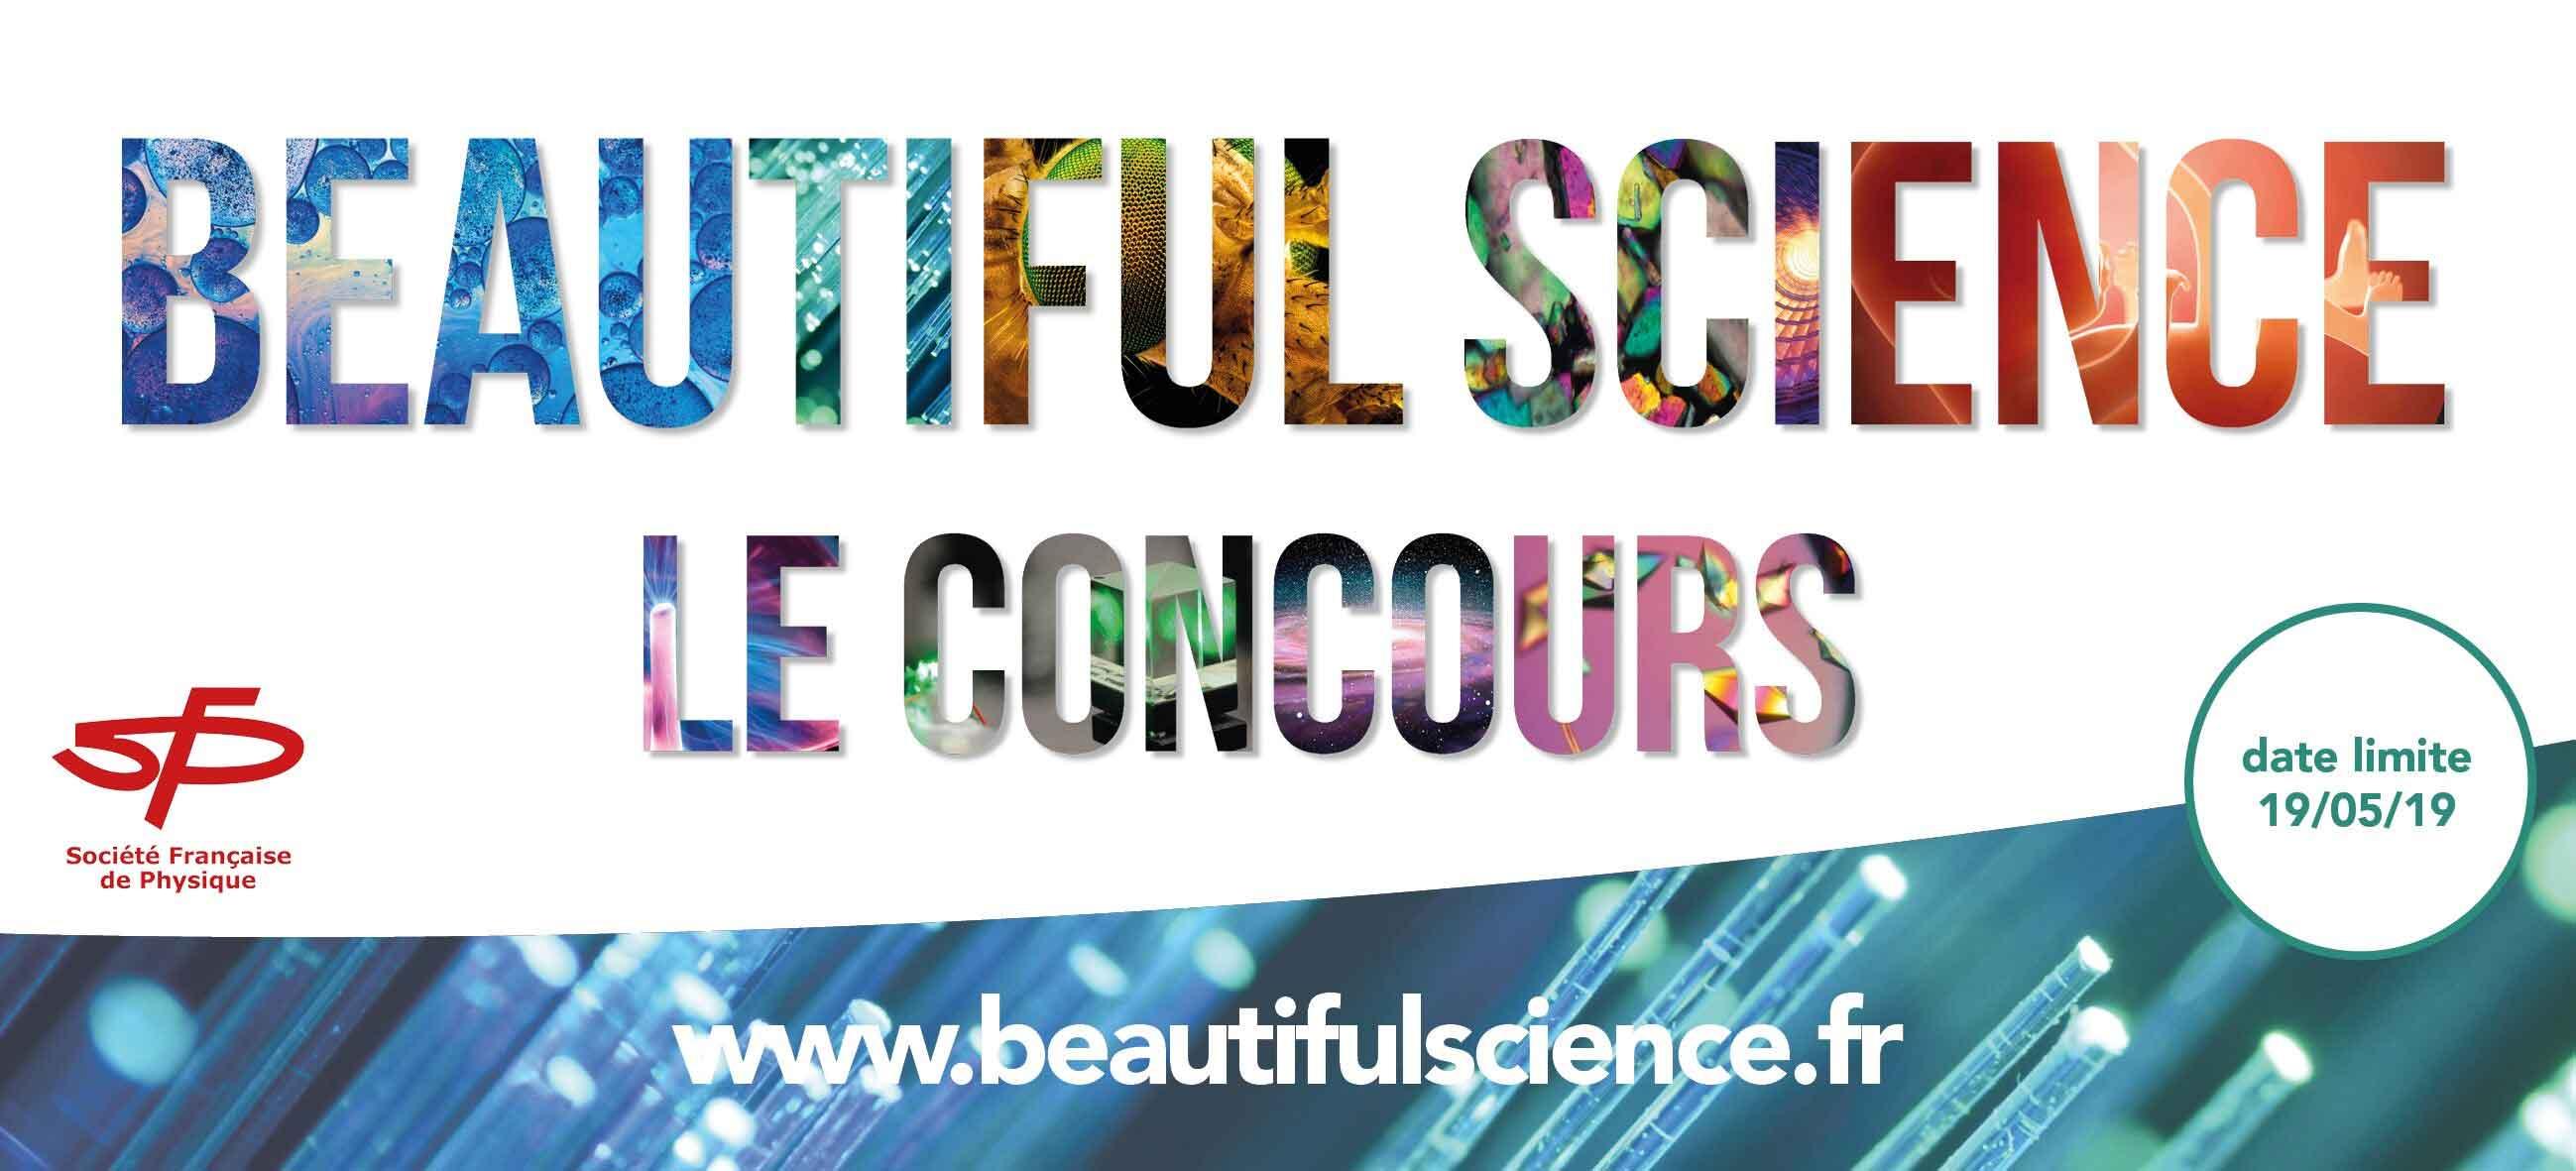 is_beautifulscience_2019.jpg